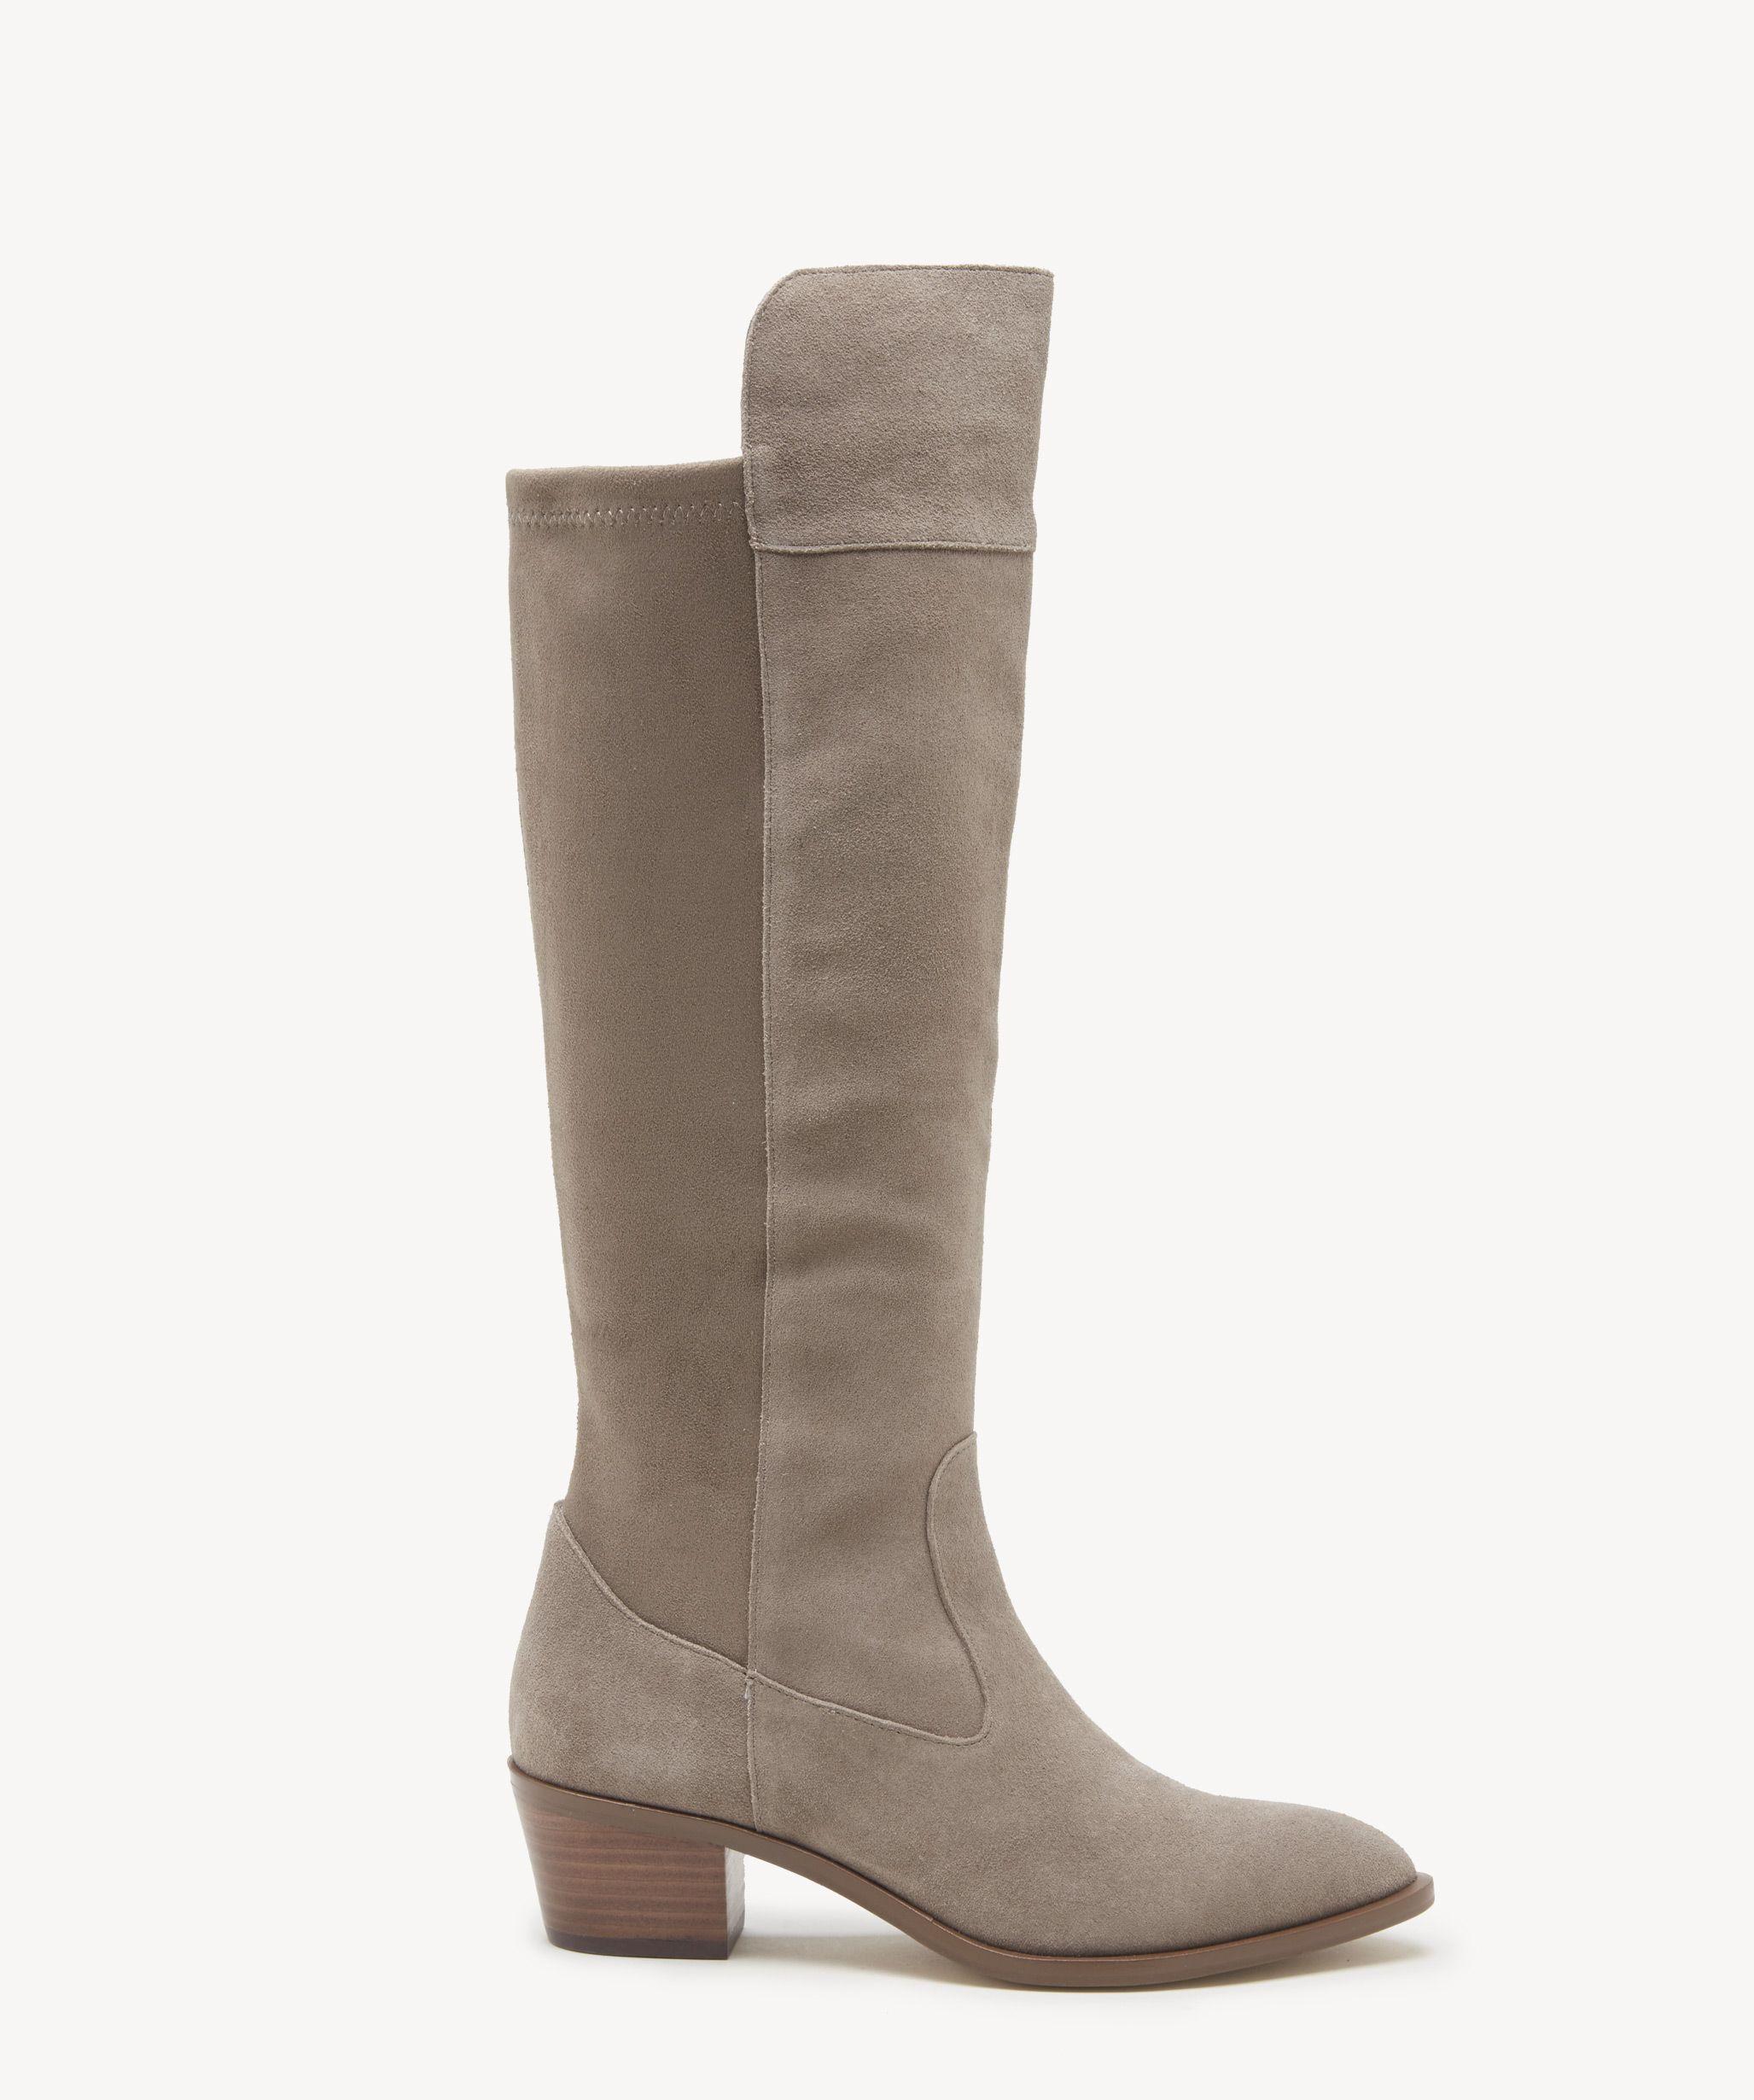 b5b84d0ab6b Women s Noamie Tall Heeled Boots Fall Taupe